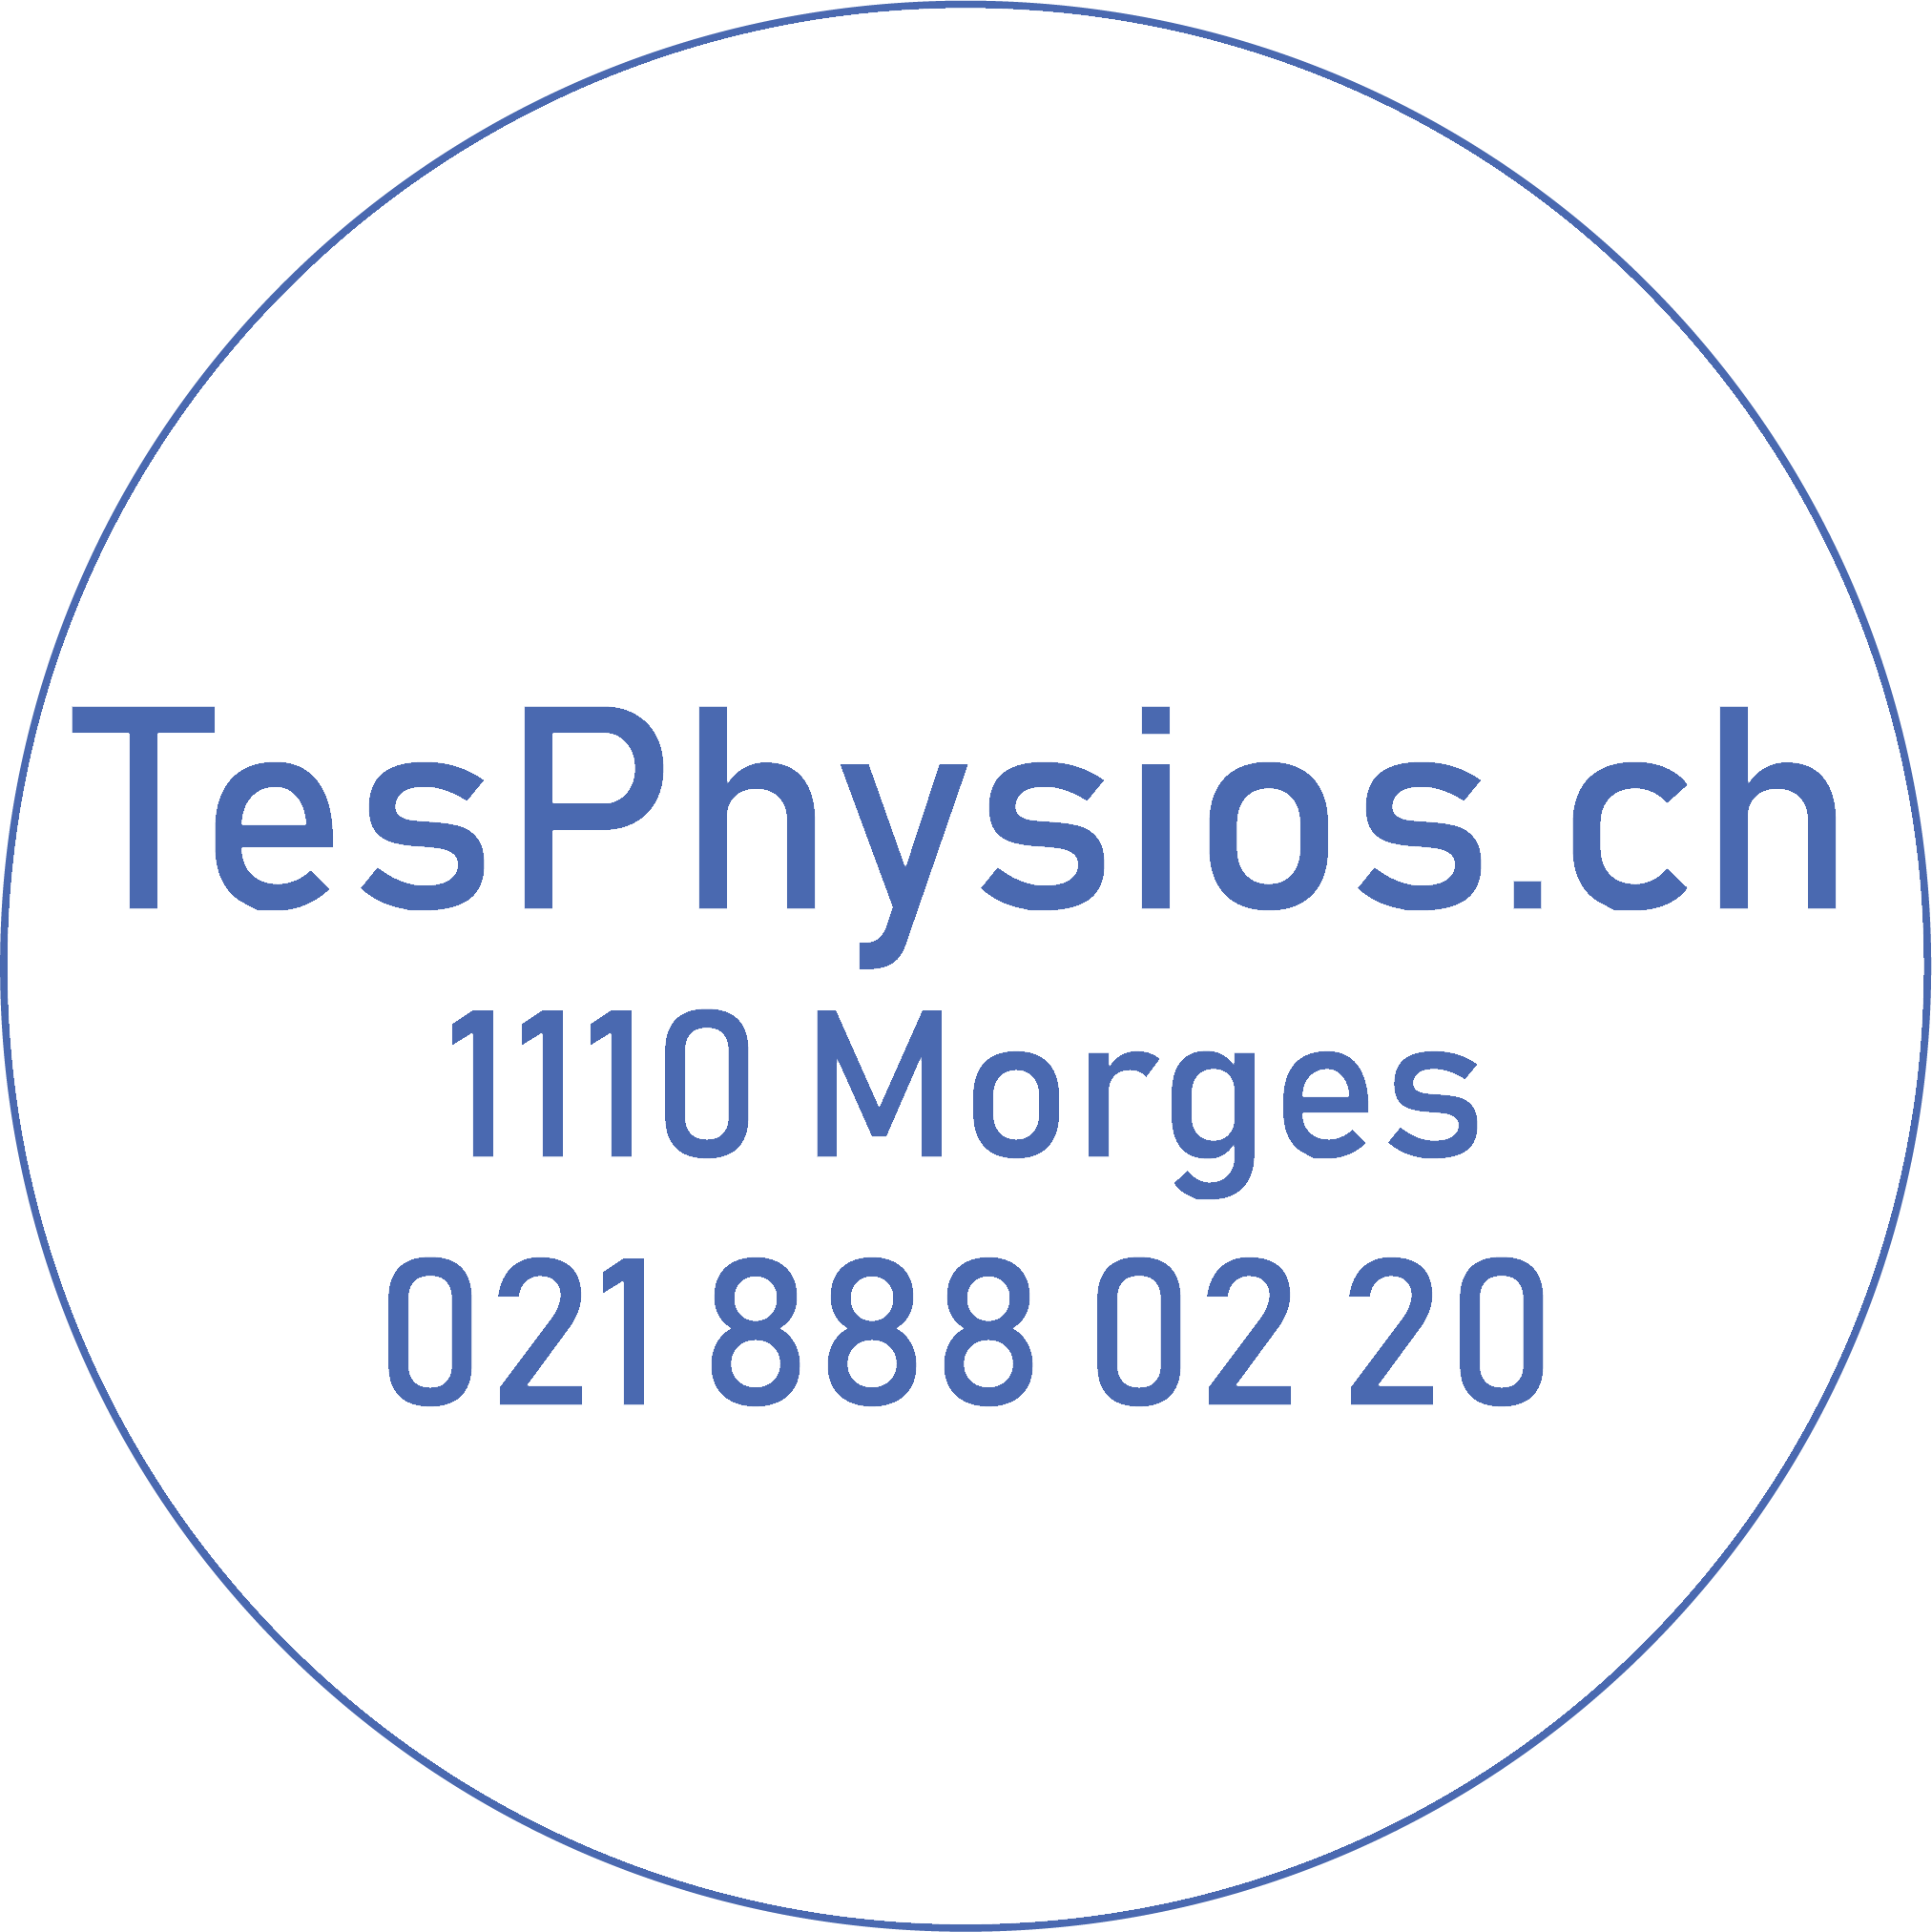 Tes Physios